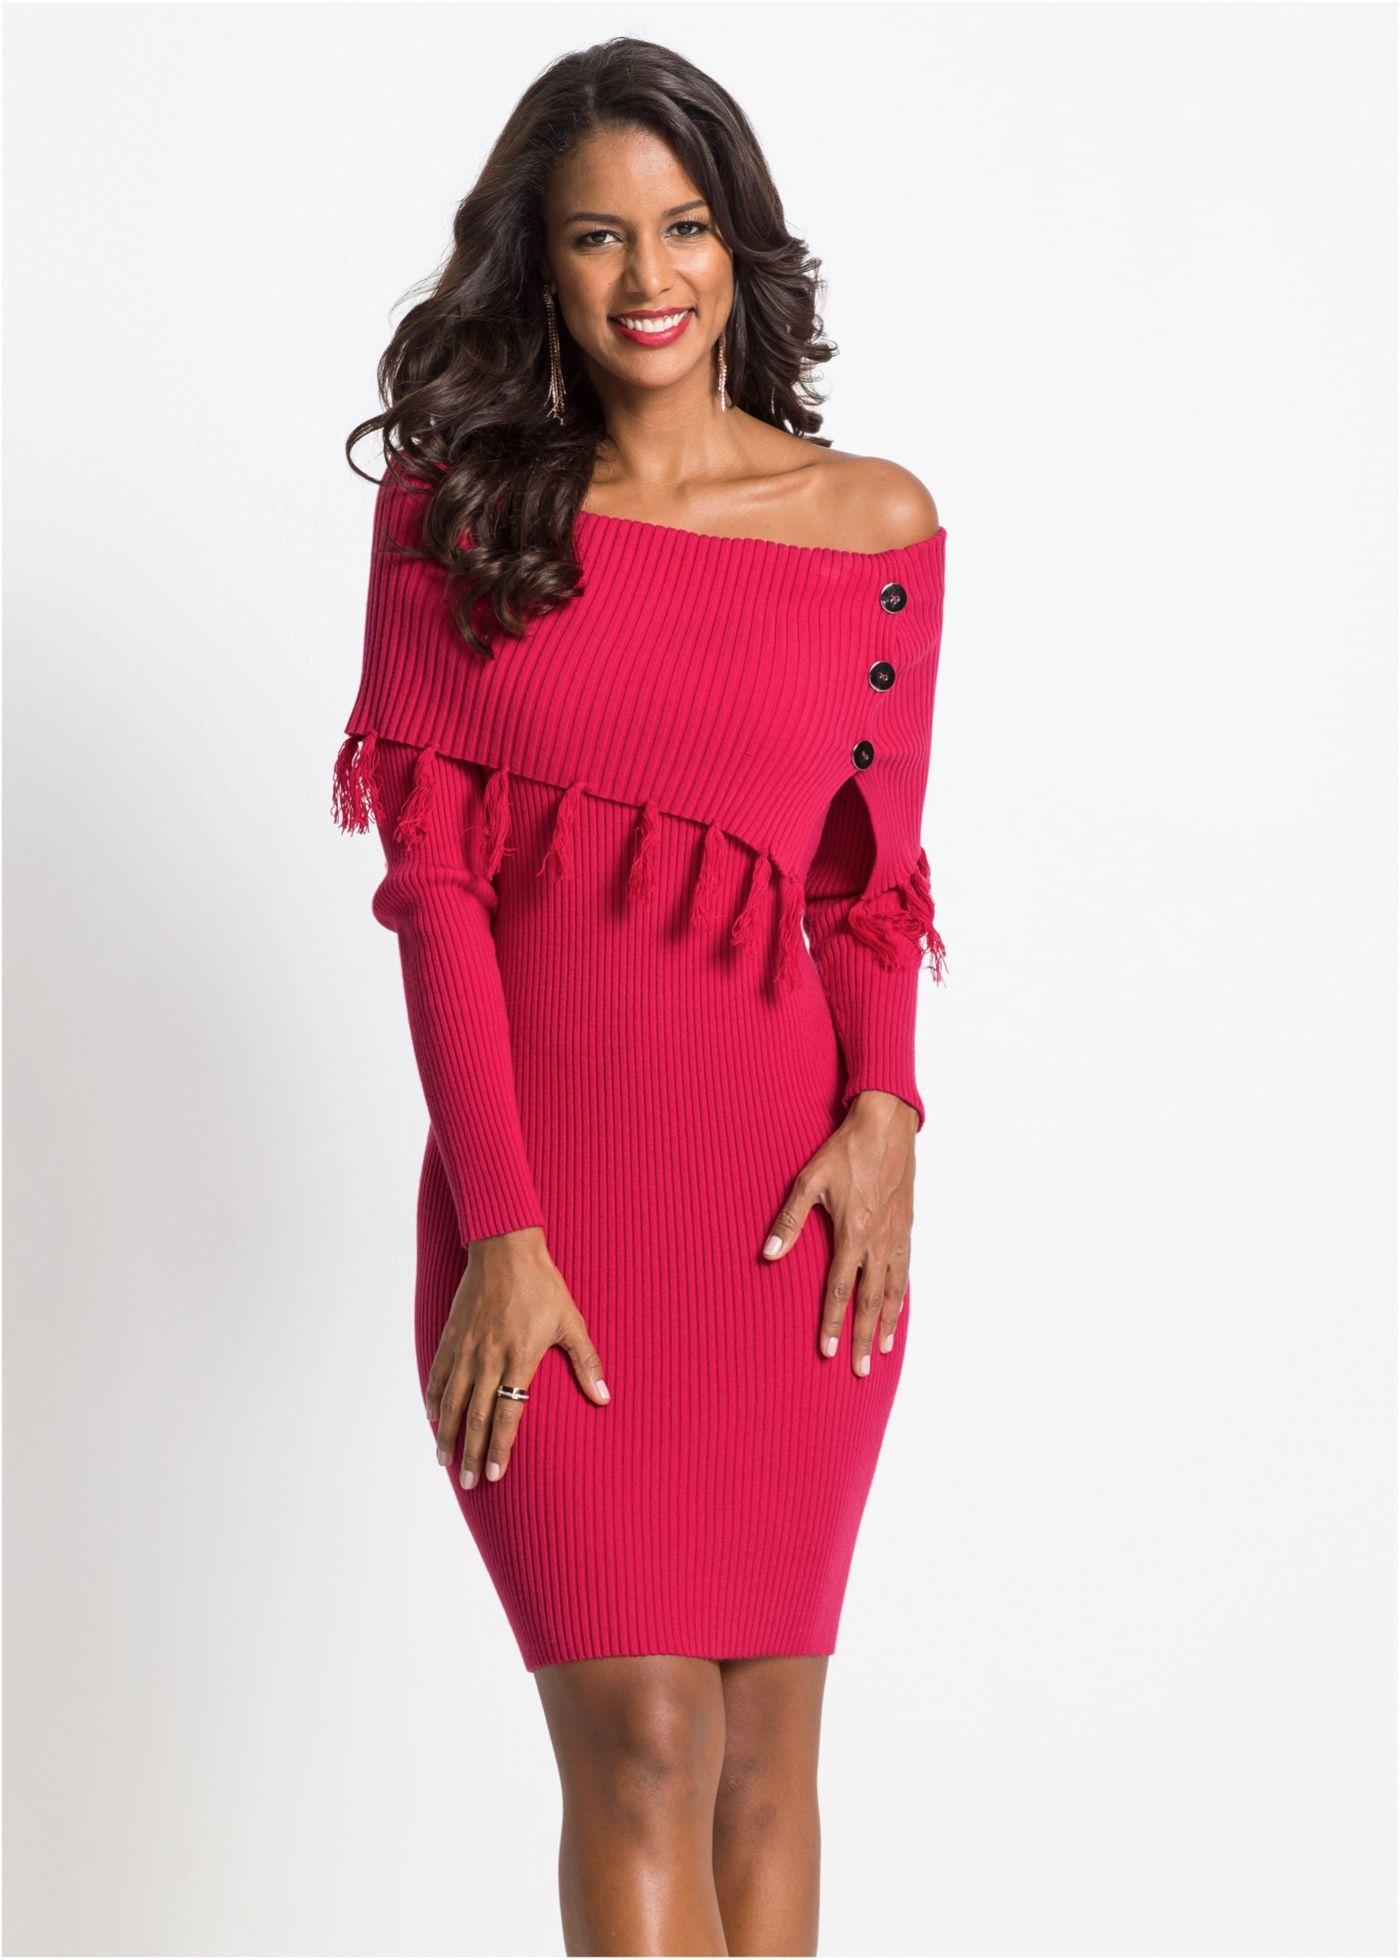 Pletené šaty s Carmen výstřihem 8379f24c7e